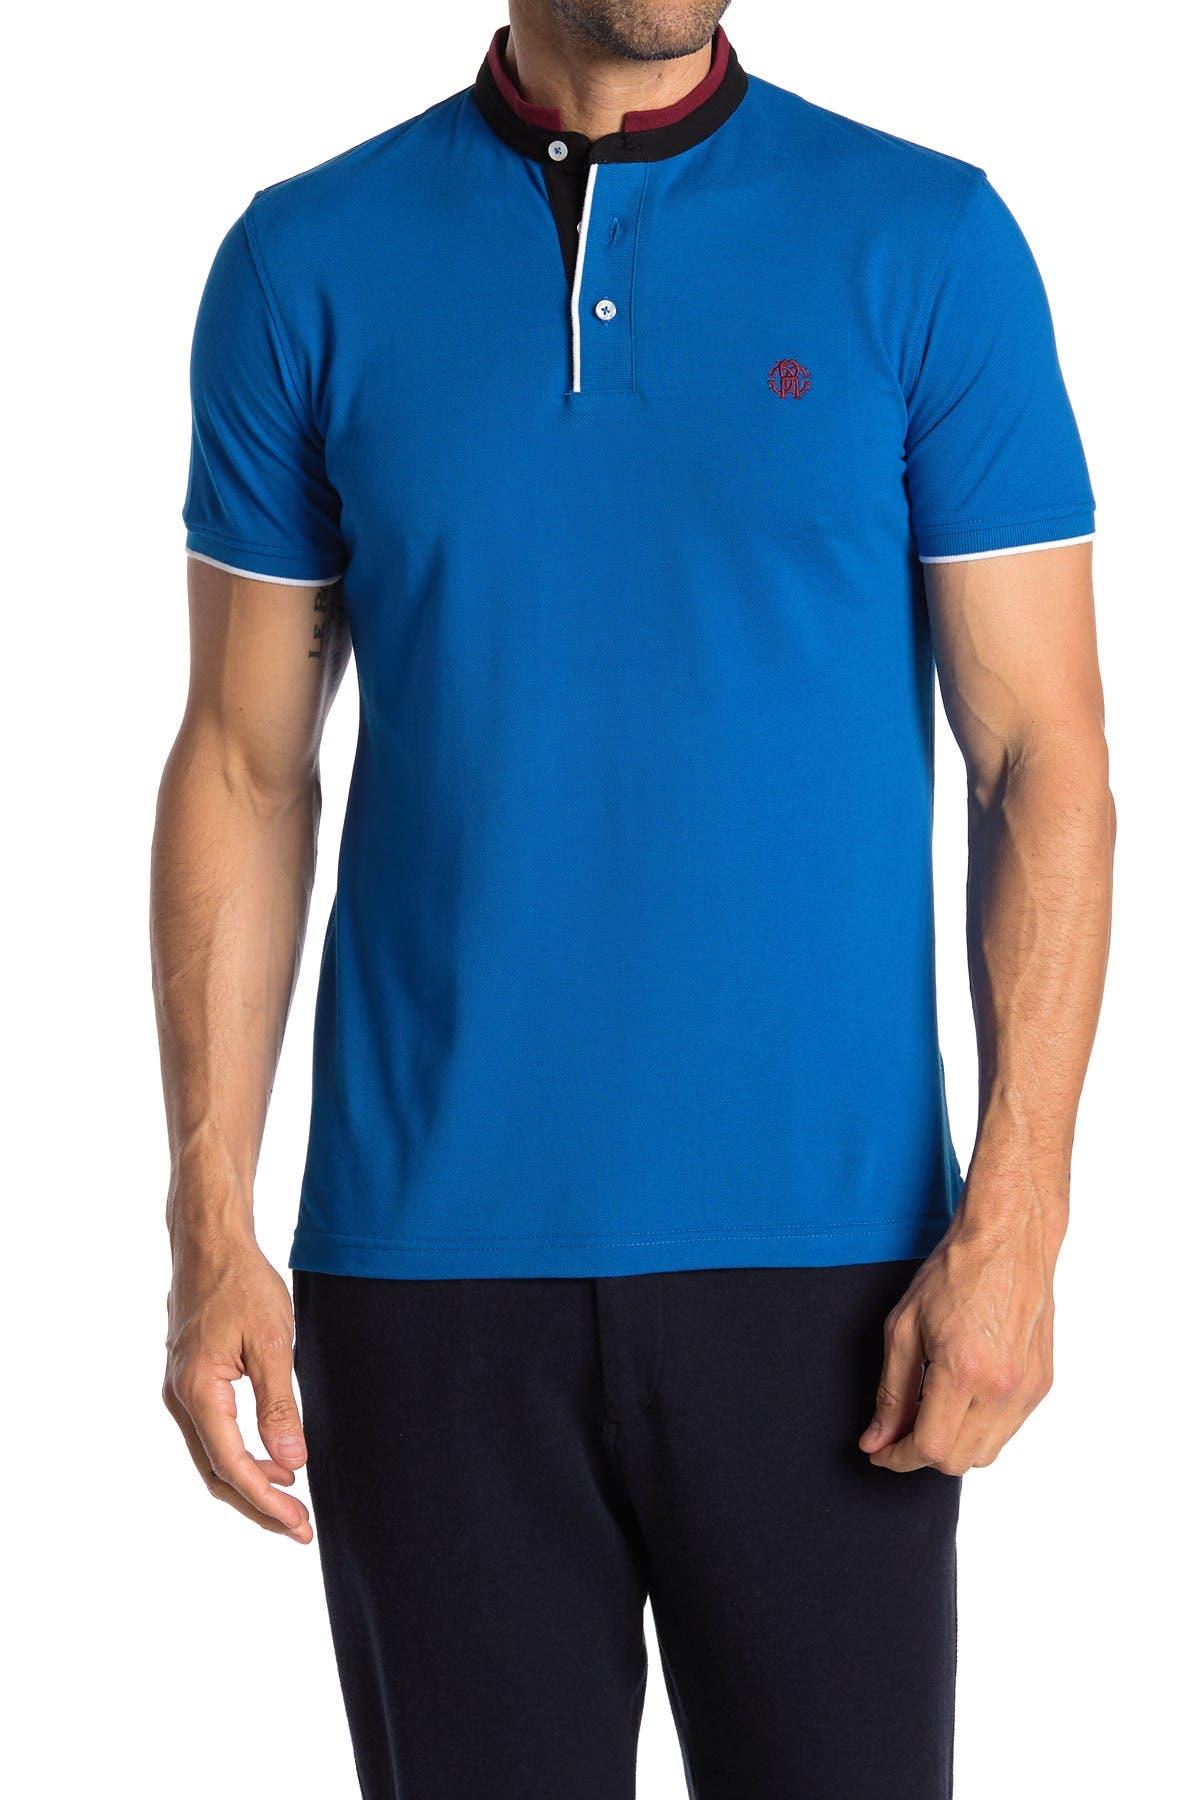 Image of Roberto Cavalli Contrast Band Collar Short Sleeve Polo